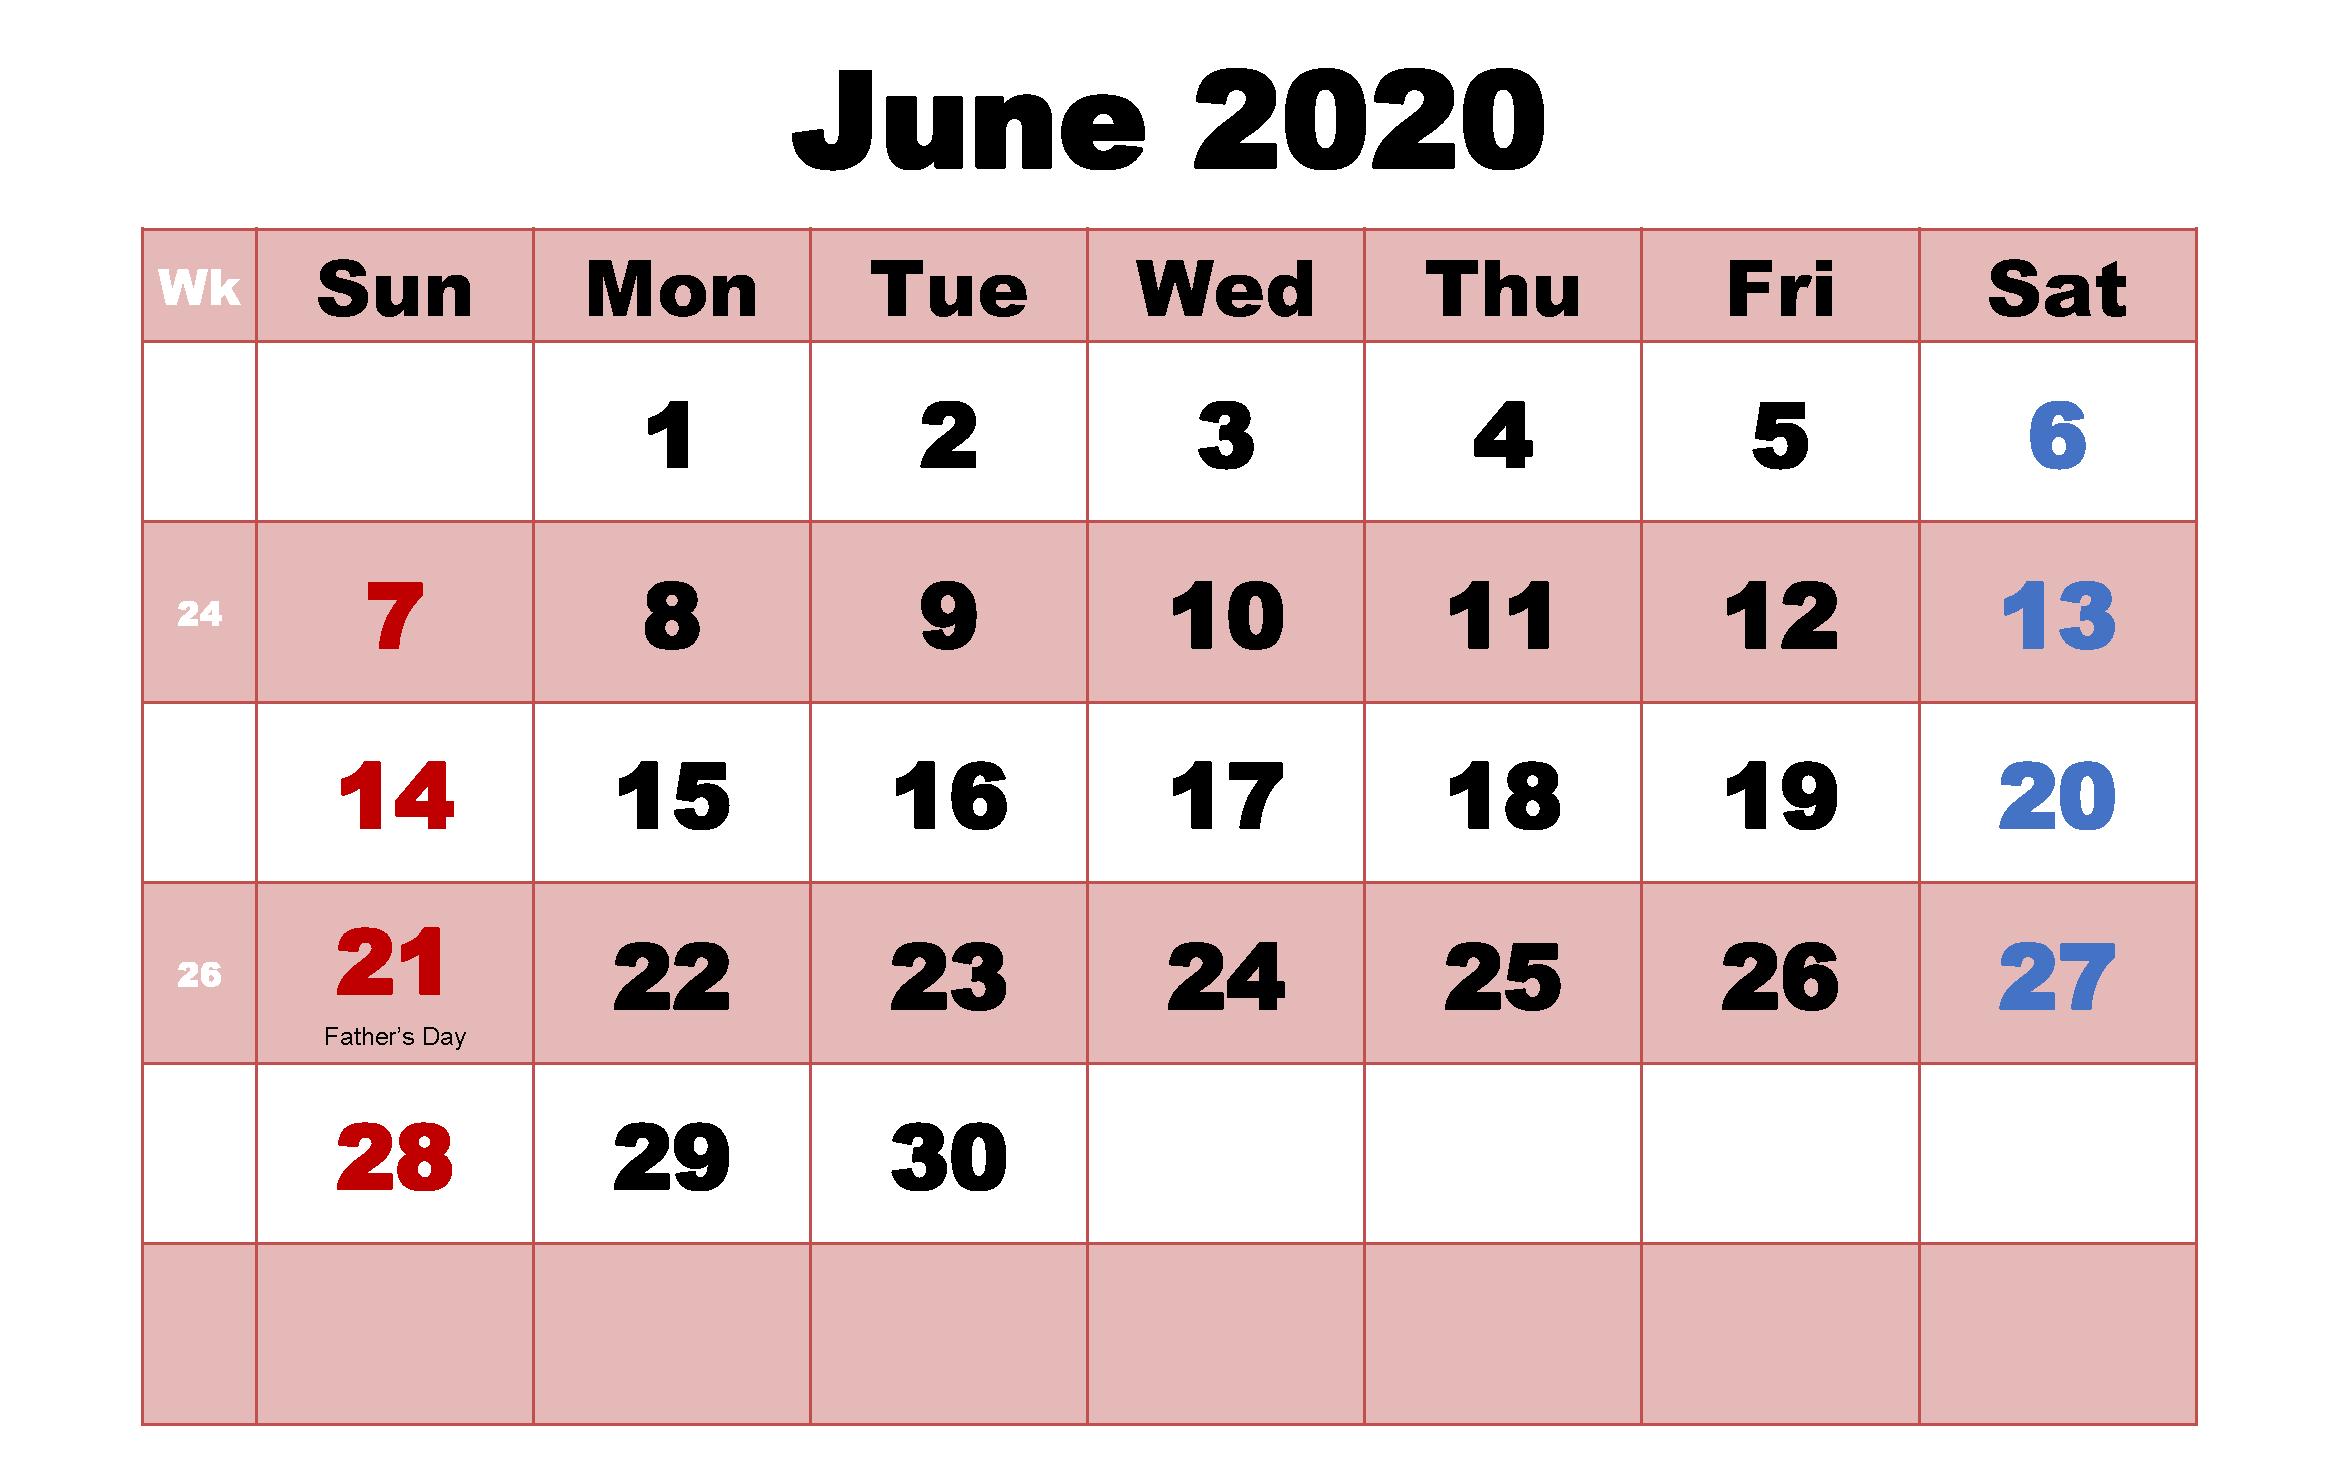 June 2020 Calendar With Holidays Usa Uk Canada India